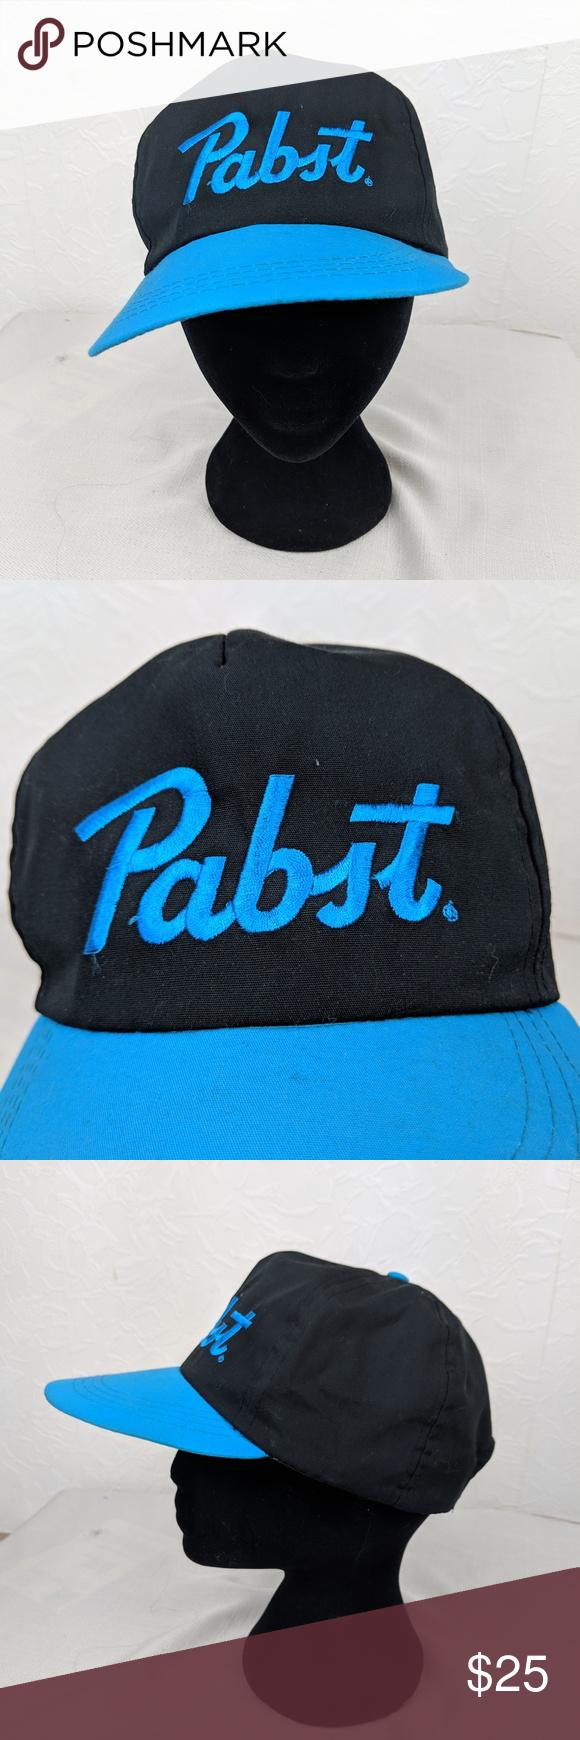 e741a746639 PABST Beer PBR Snap Back Hat PABST Beer PBR Snap Back Hat Good